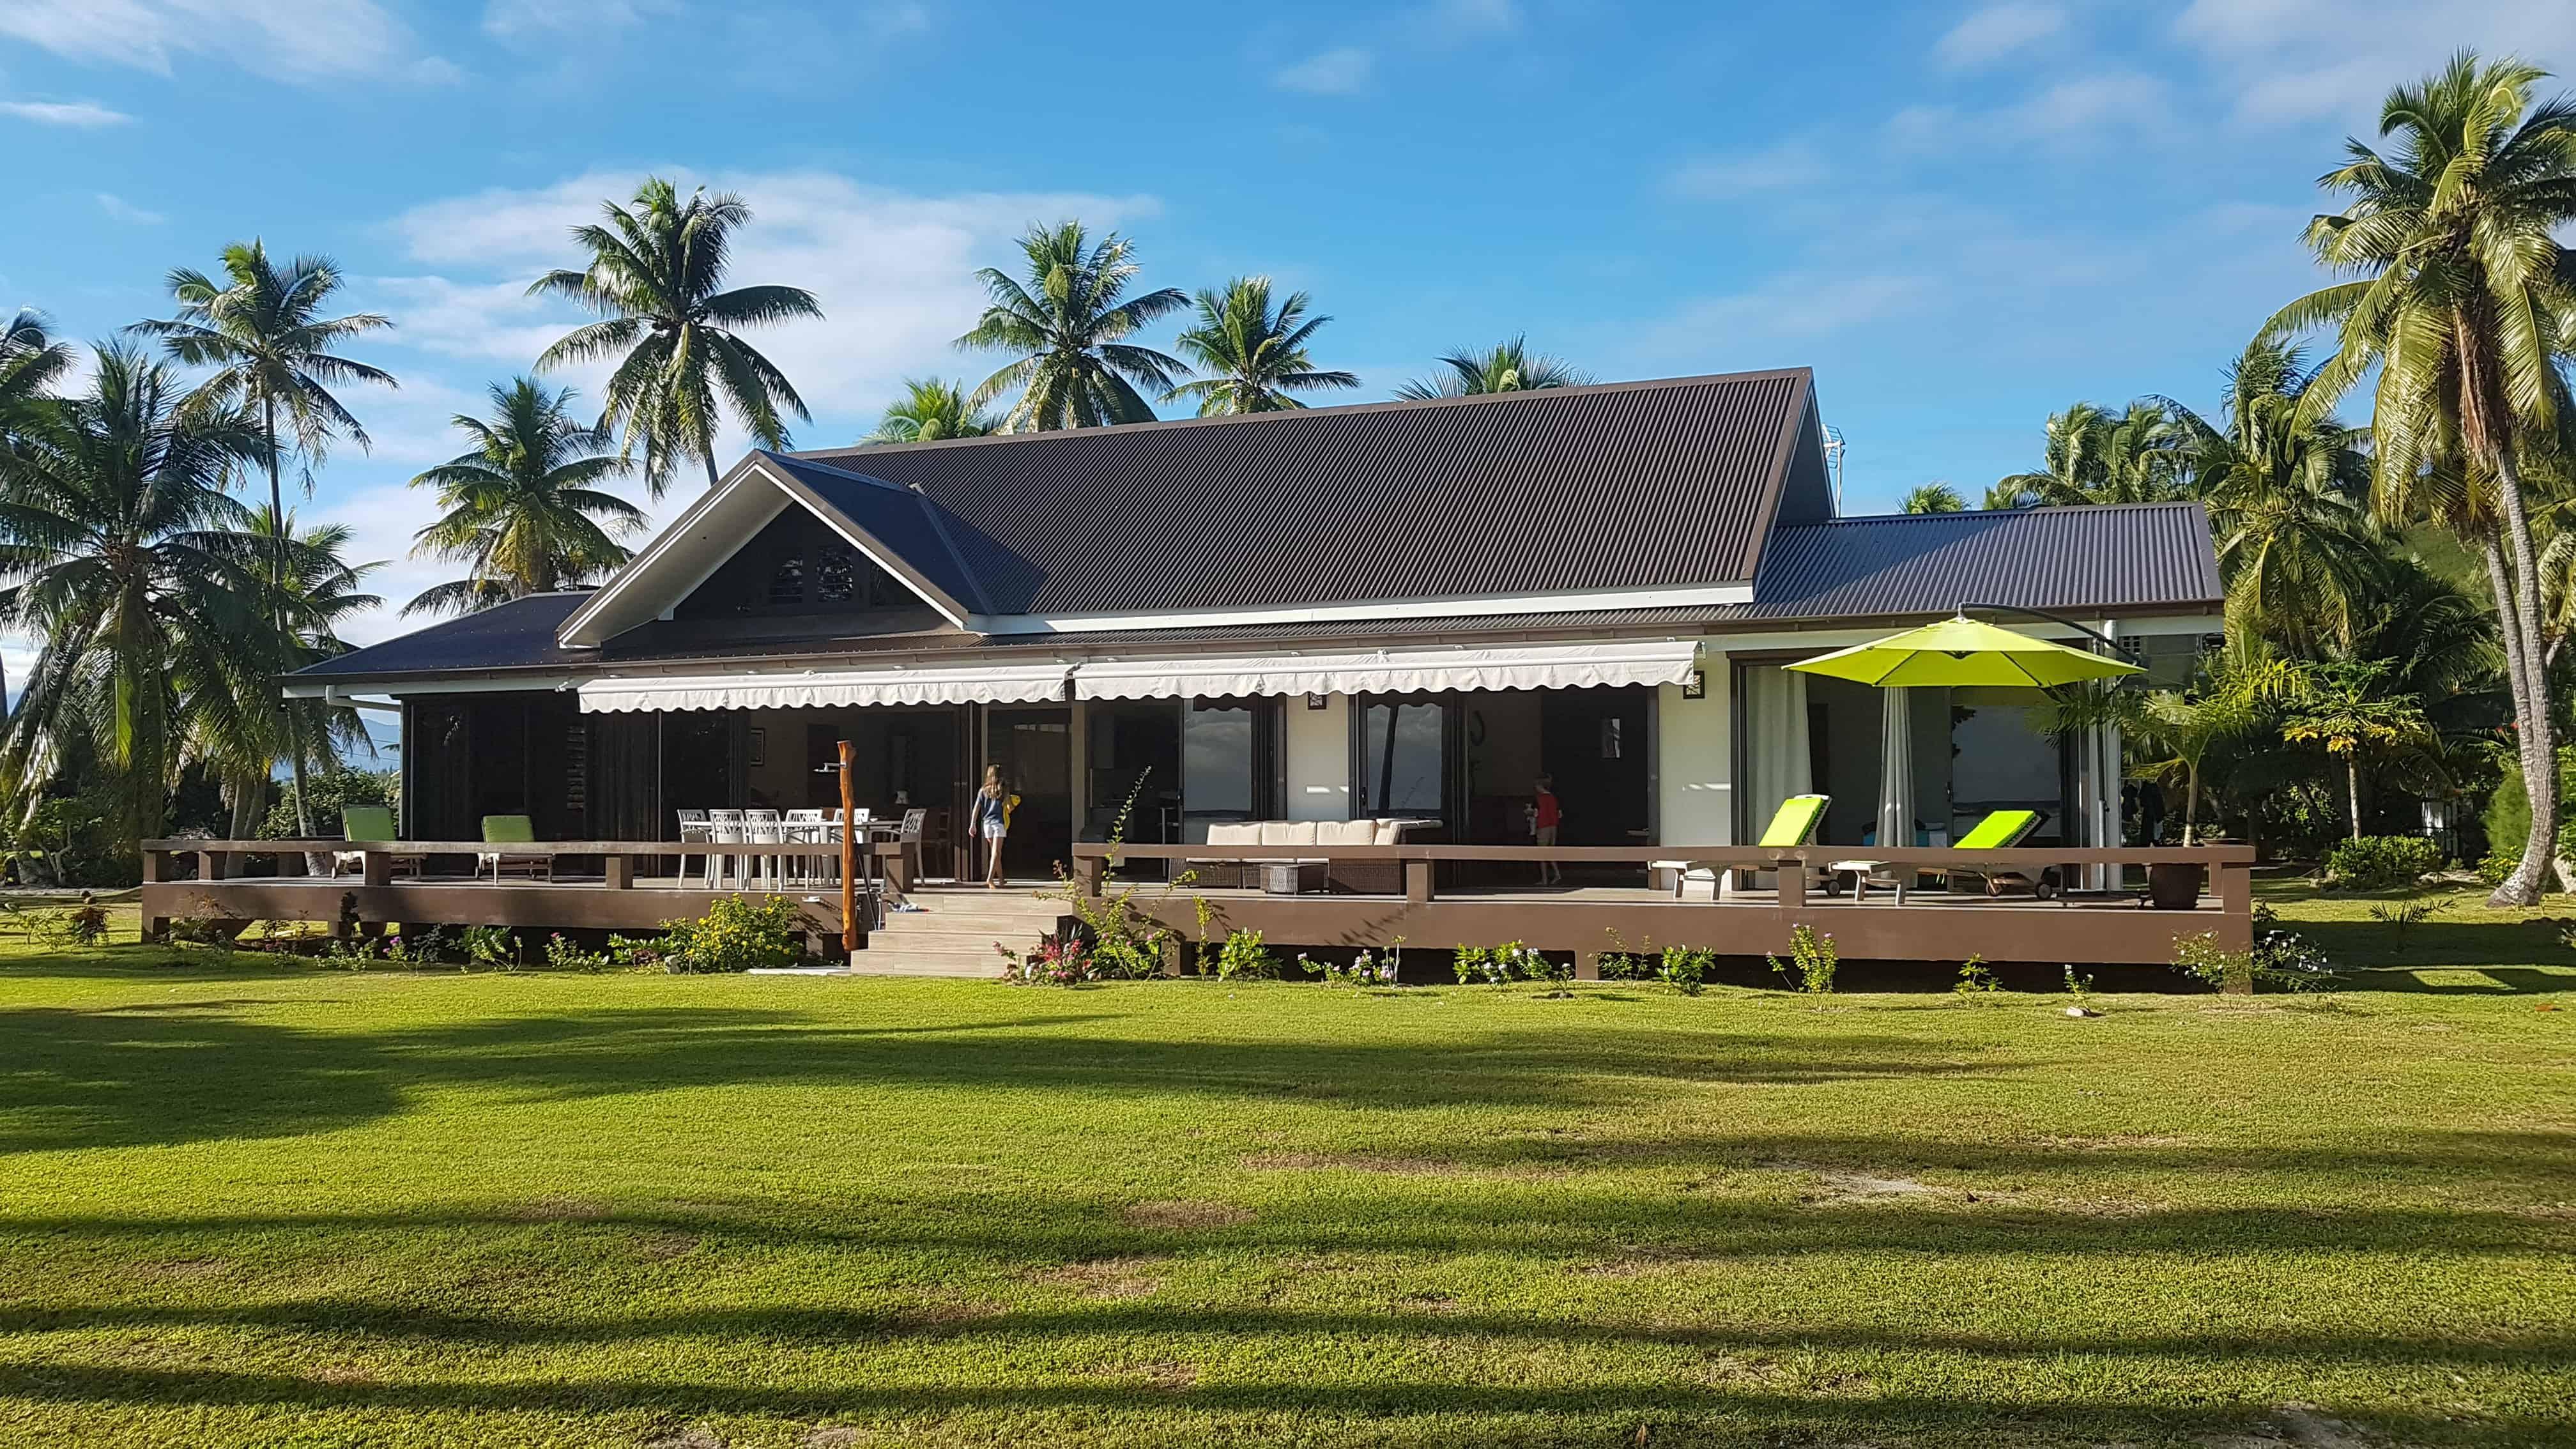 https://tahititourisme.uk/wp-content/uploads/2018/09/Villa-Tiarenui-by-Tahiti-Homes-®-a-Moorea-4.jpg